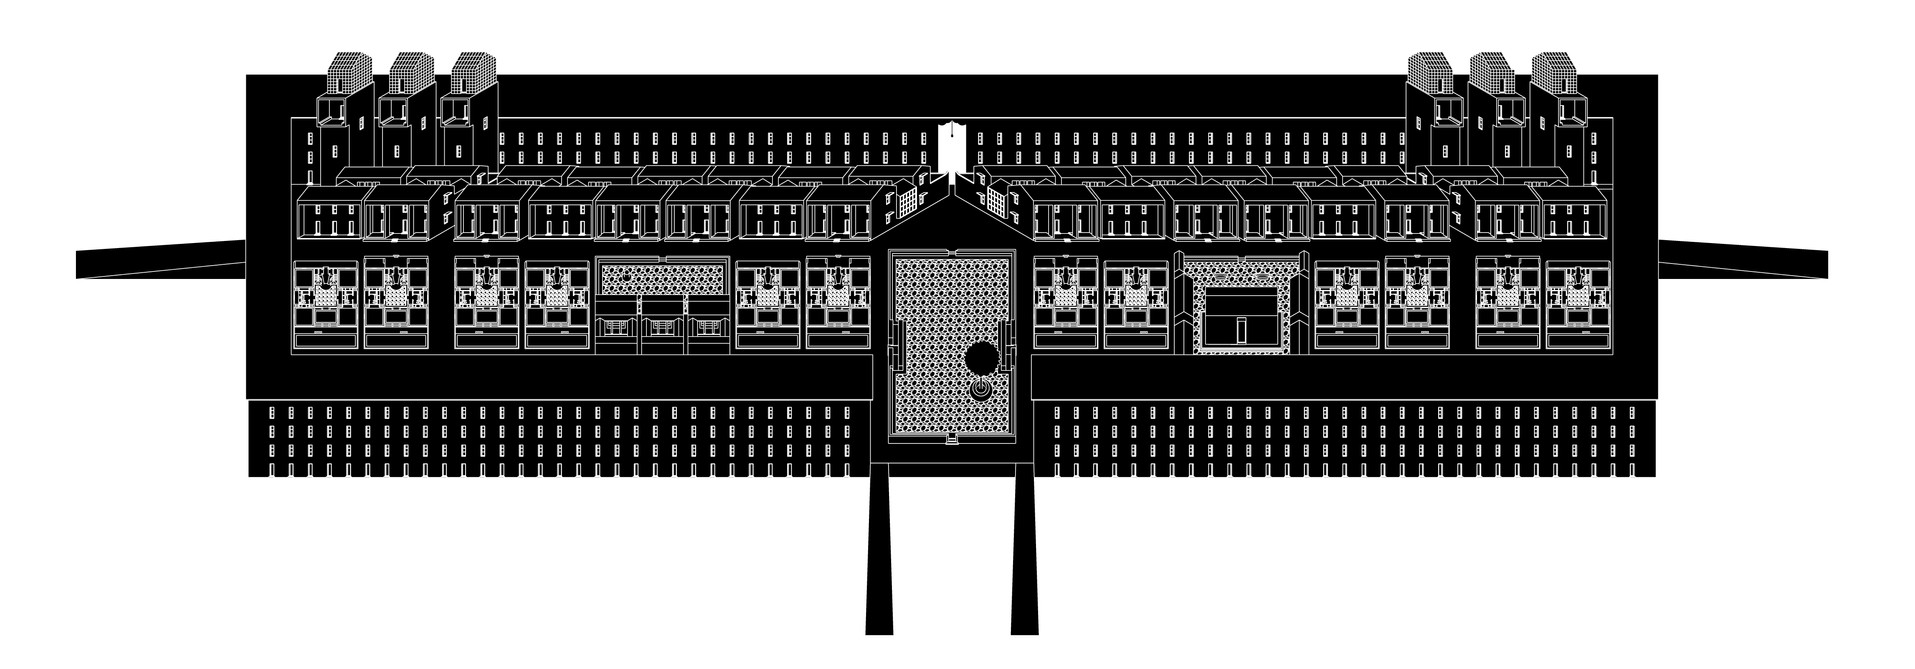 18-02 CHINESE VILLAGE Black on White Dimetric